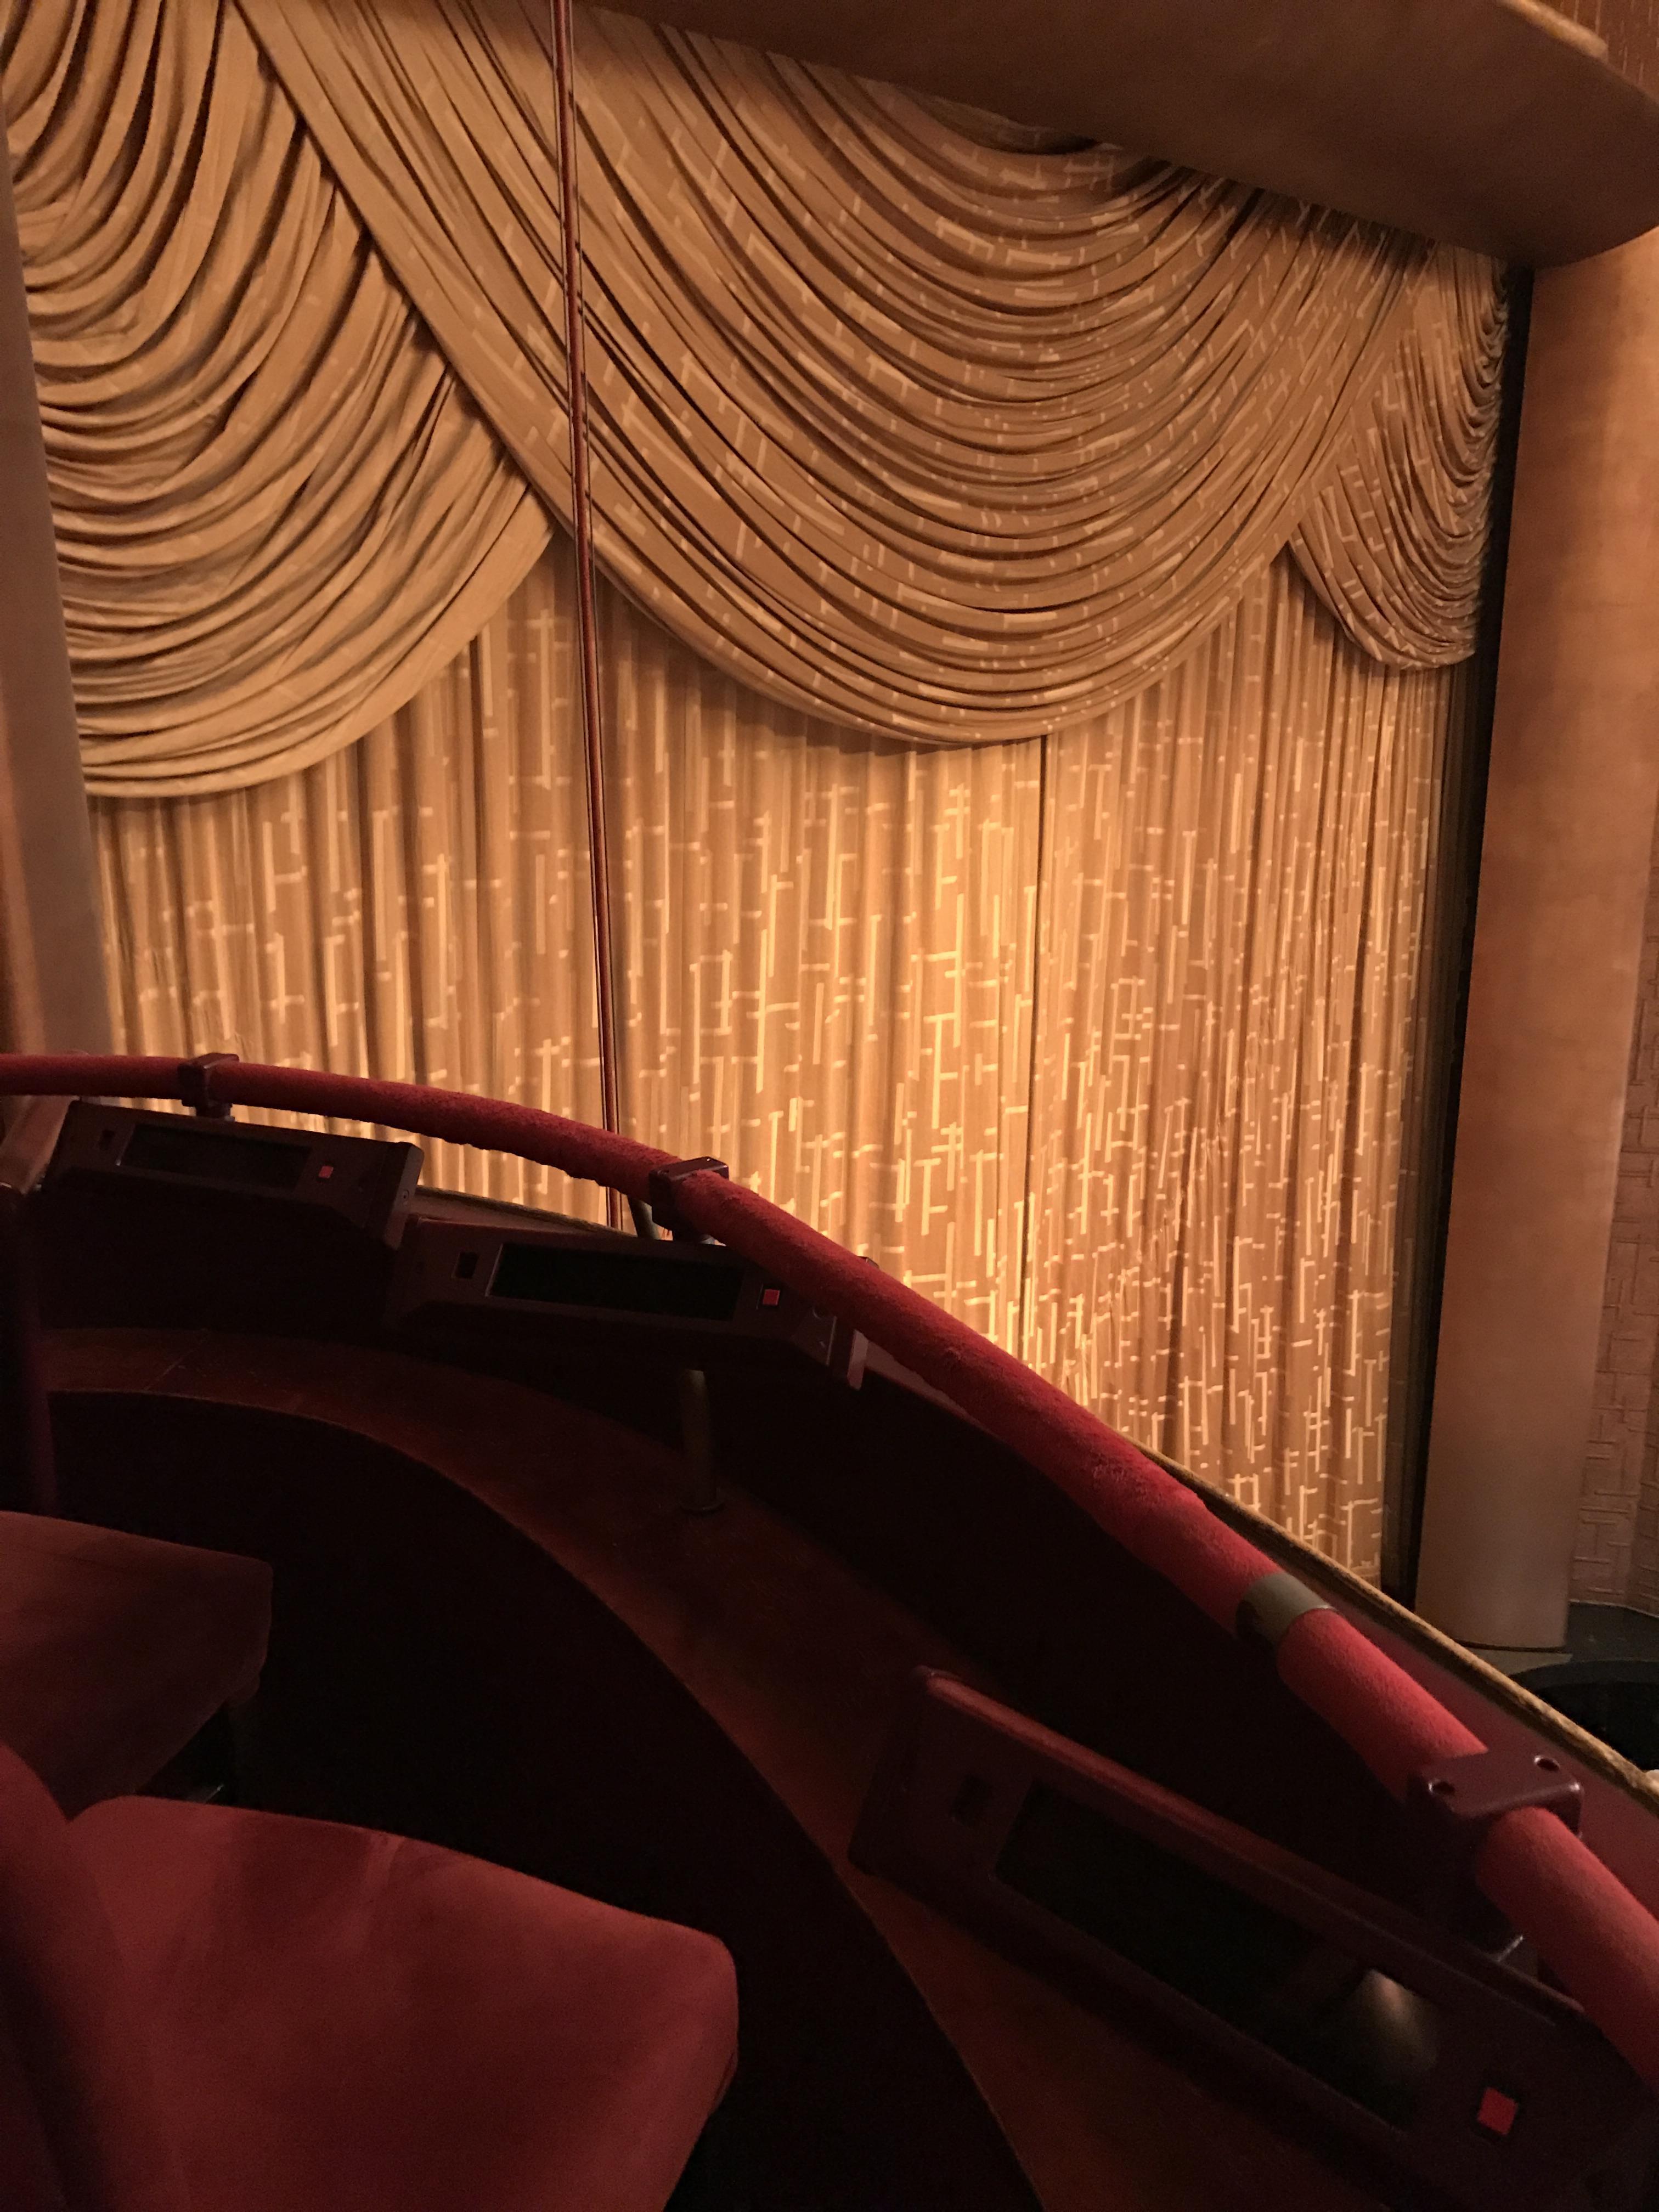 Metropolitan Opera House - Lincoln Center Section Balcony Row 1 Seat 1